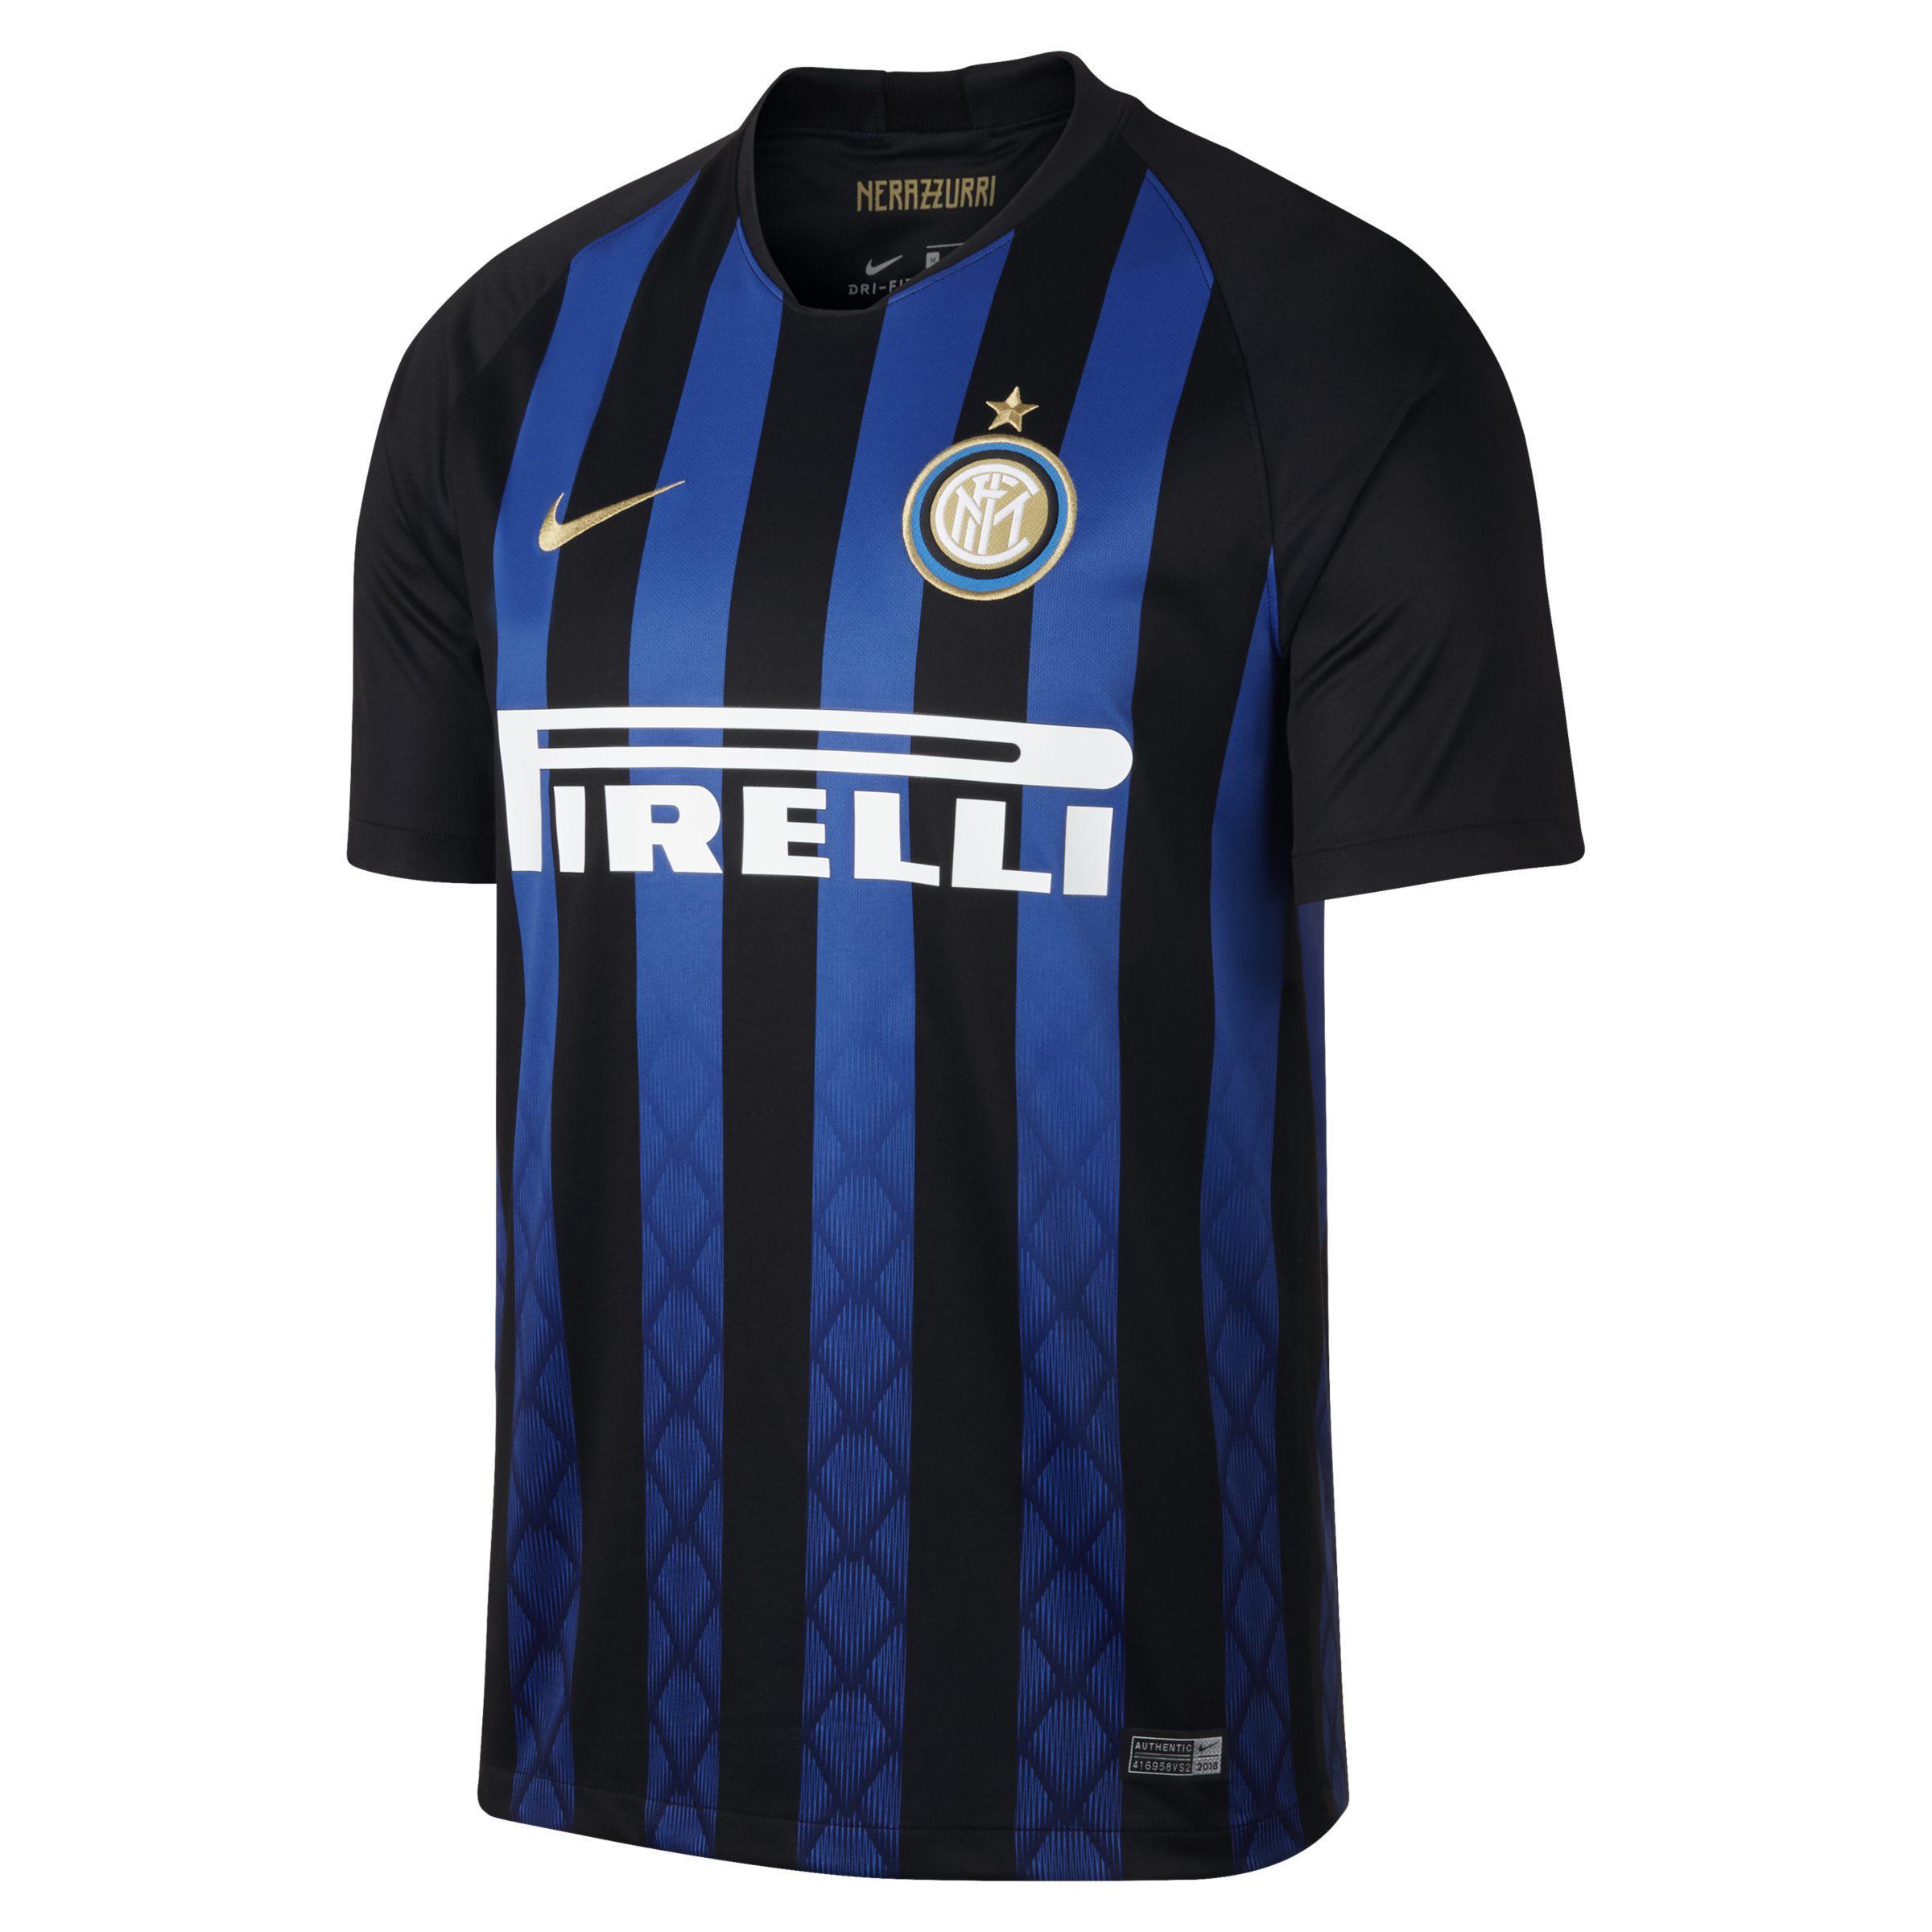 ba89dd628b7 Nike 2018/19 Inter Milan Stadium Home Football Shirt in Blue for Men ...